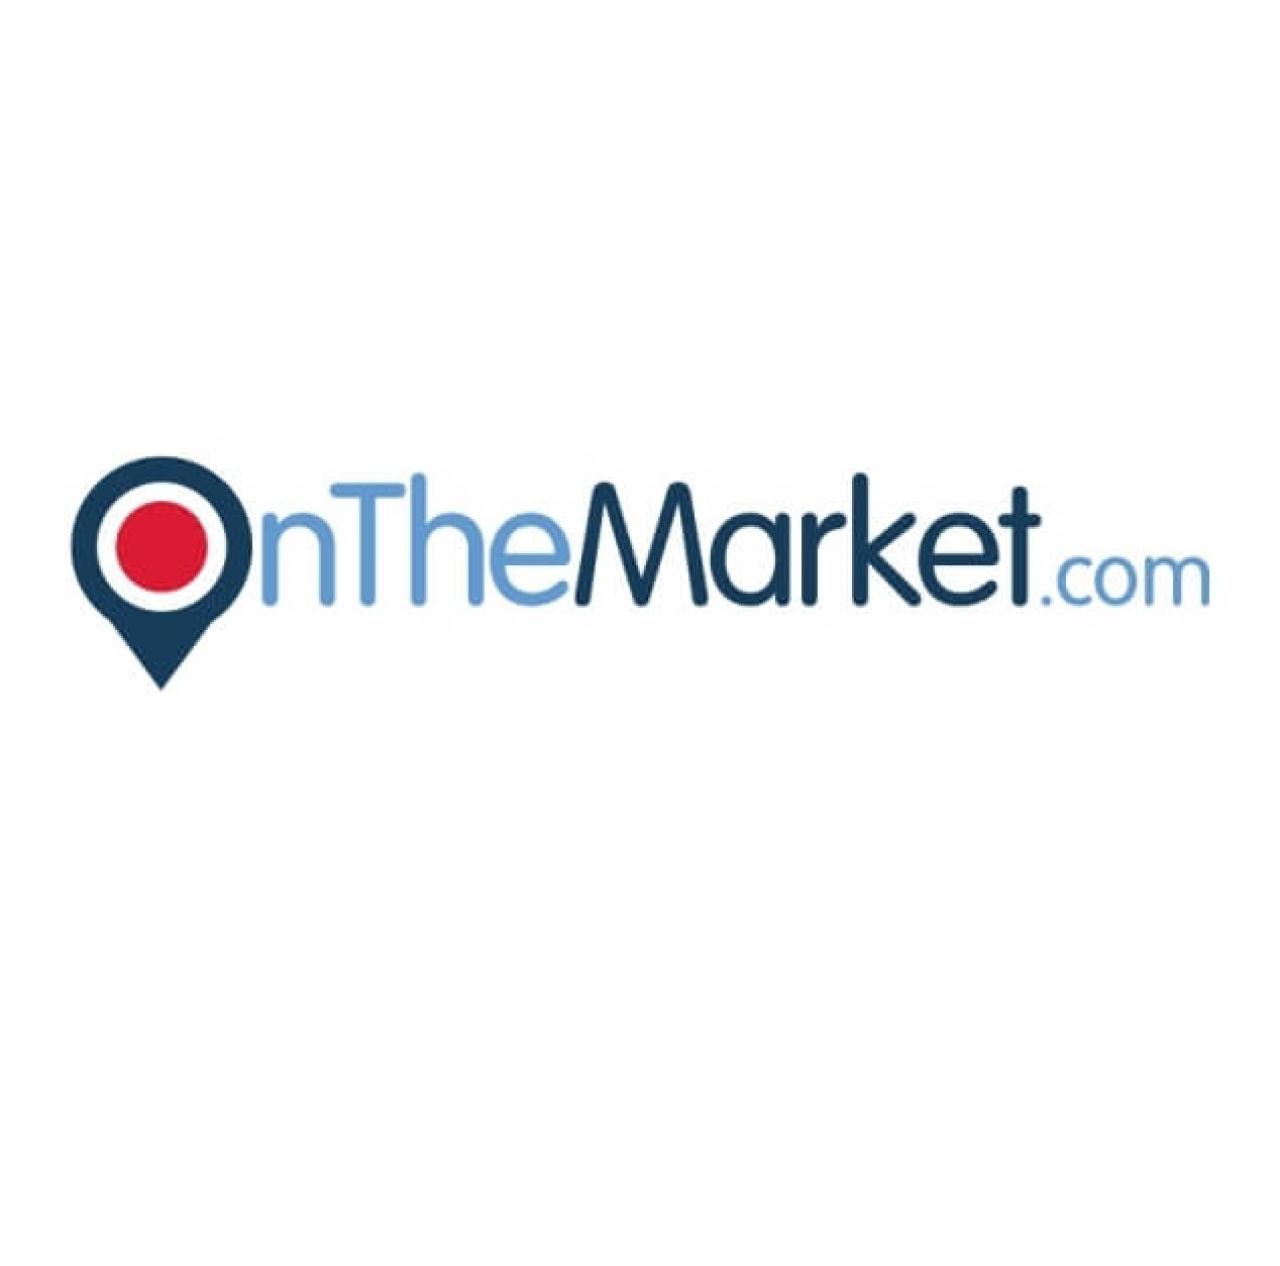 OnTheMarket.Com